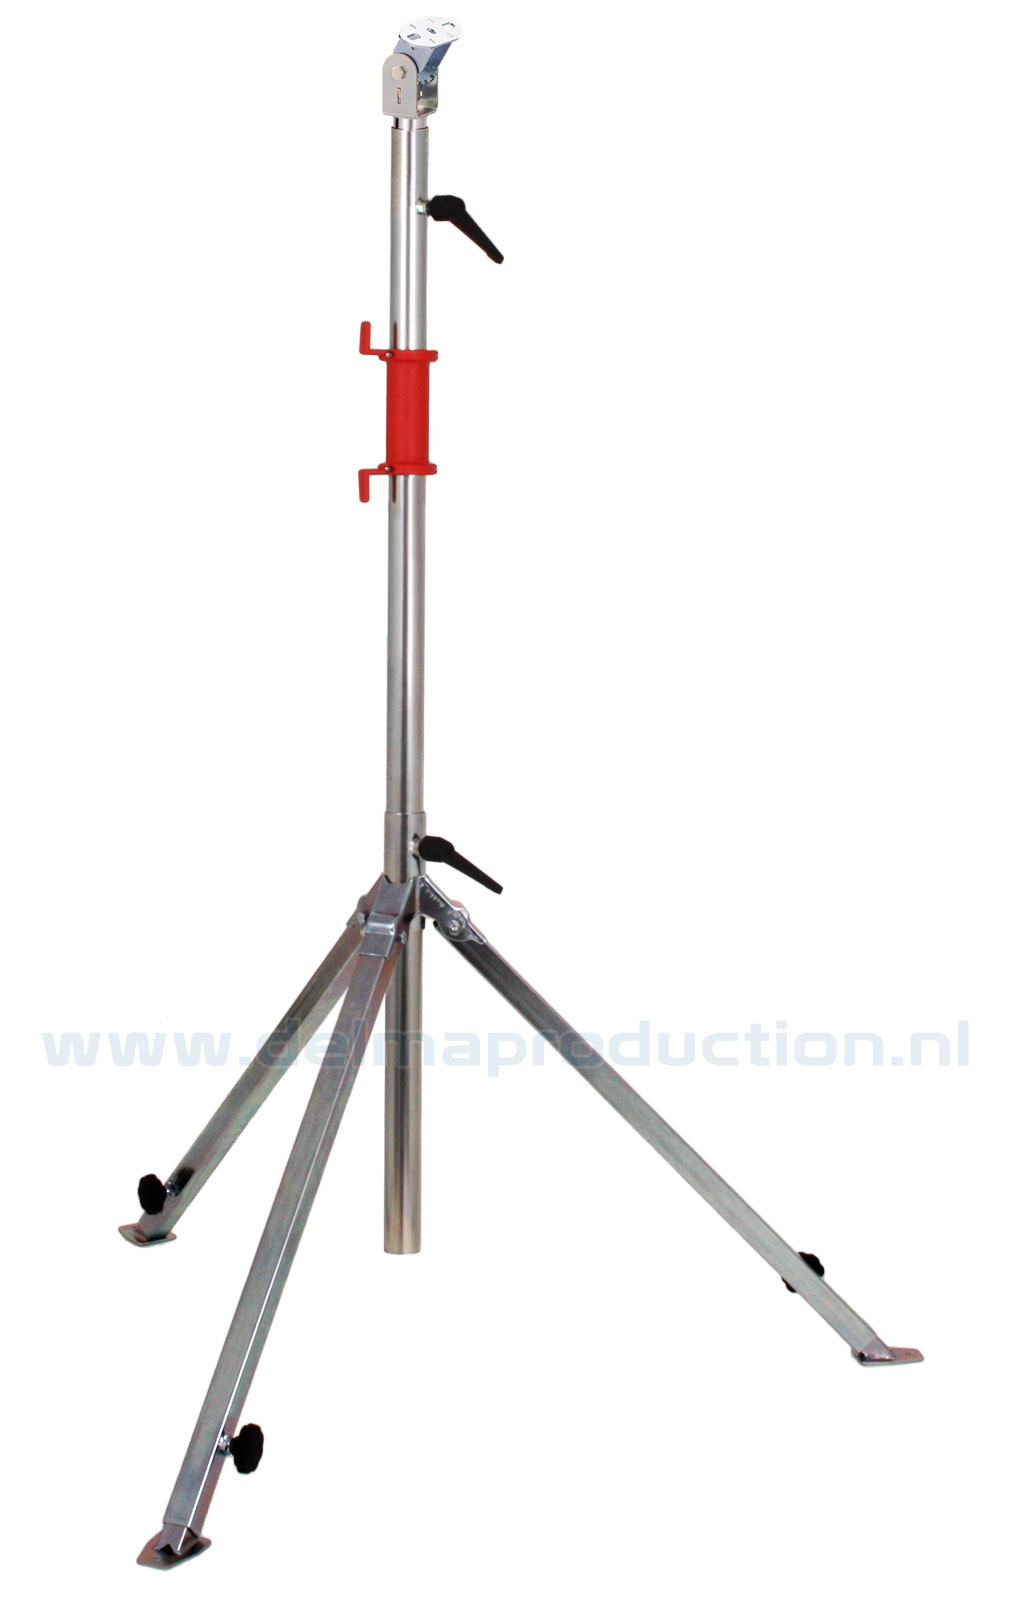 Tripod worklight stand 3-part, adjustable undercarriage, quick adjustment